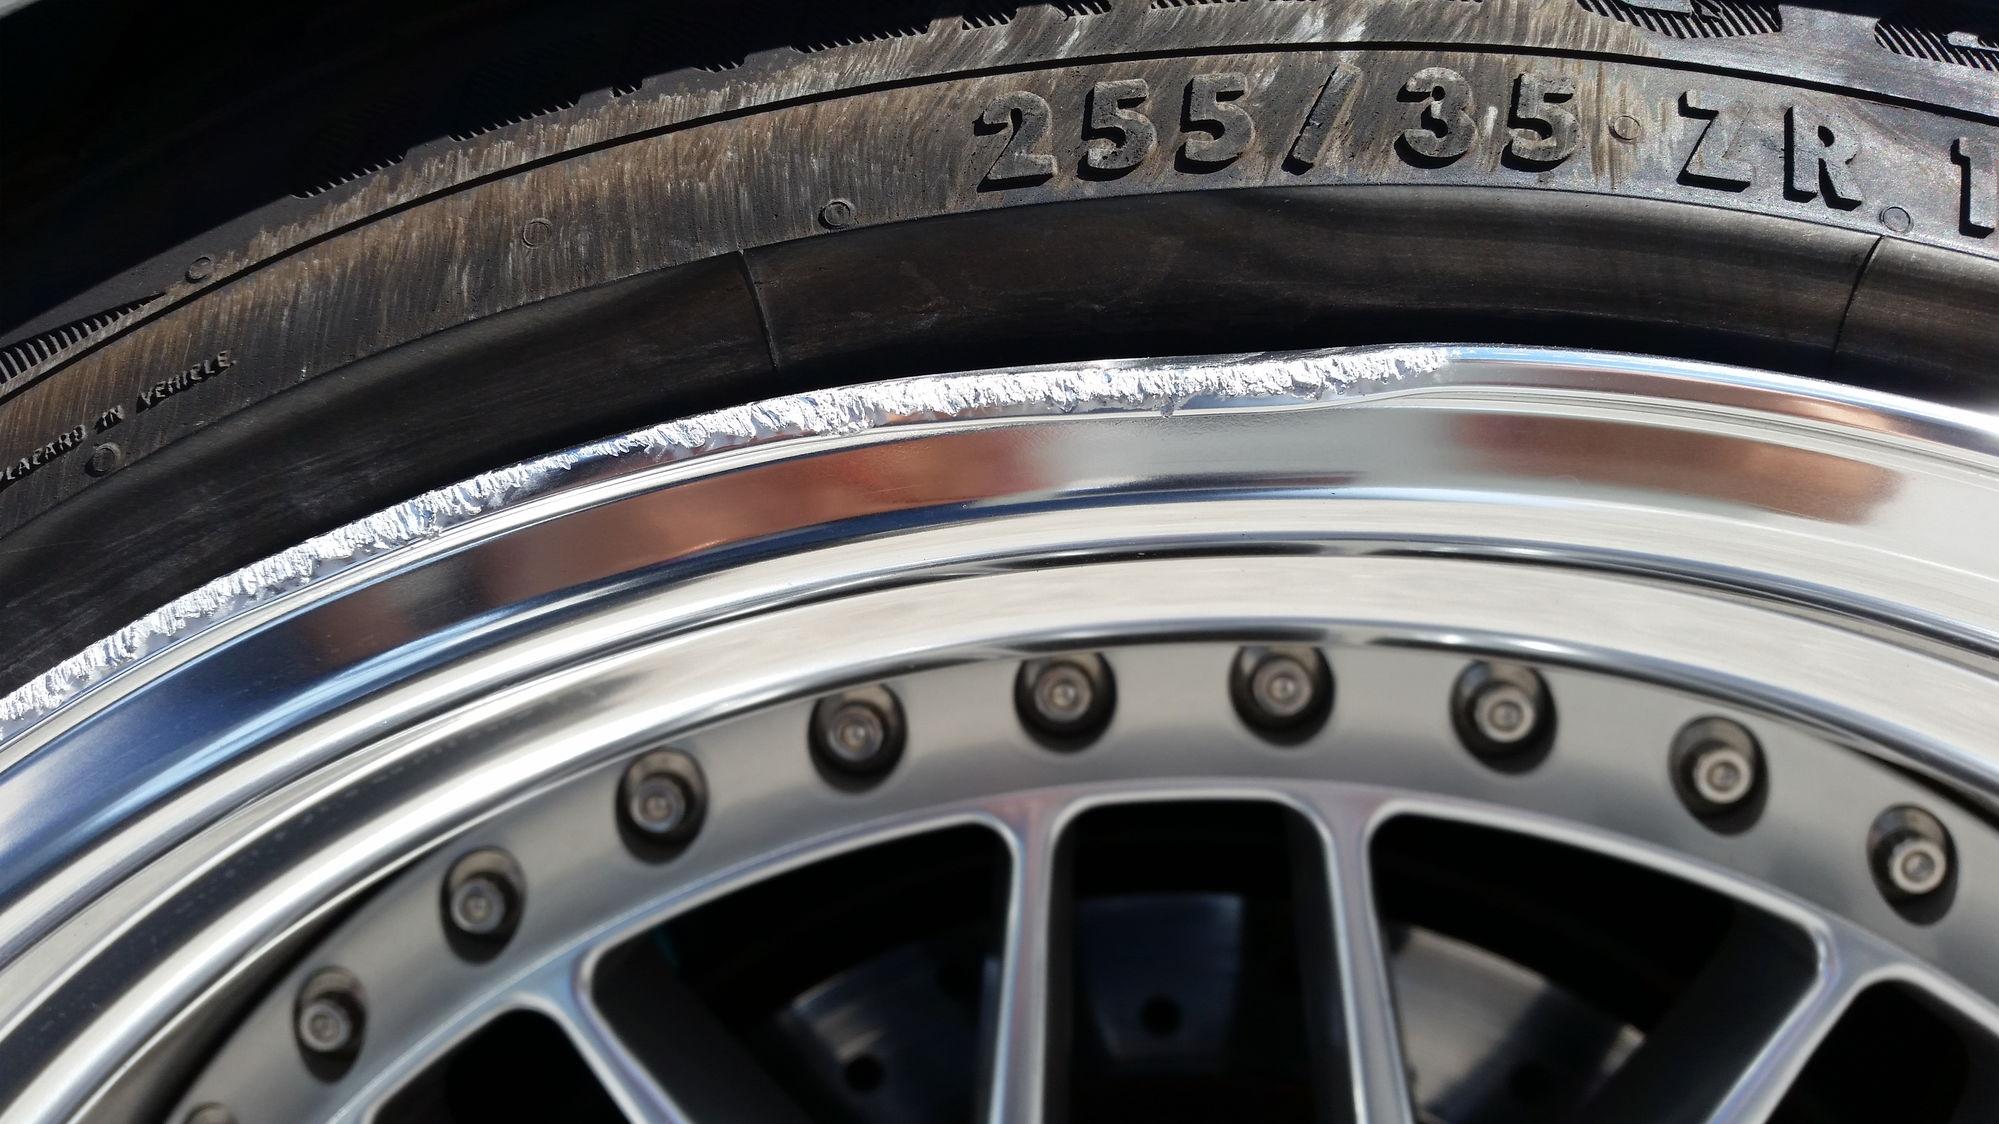 Bent outter lip on rim Easy repair ClubLexus Lexus Forum